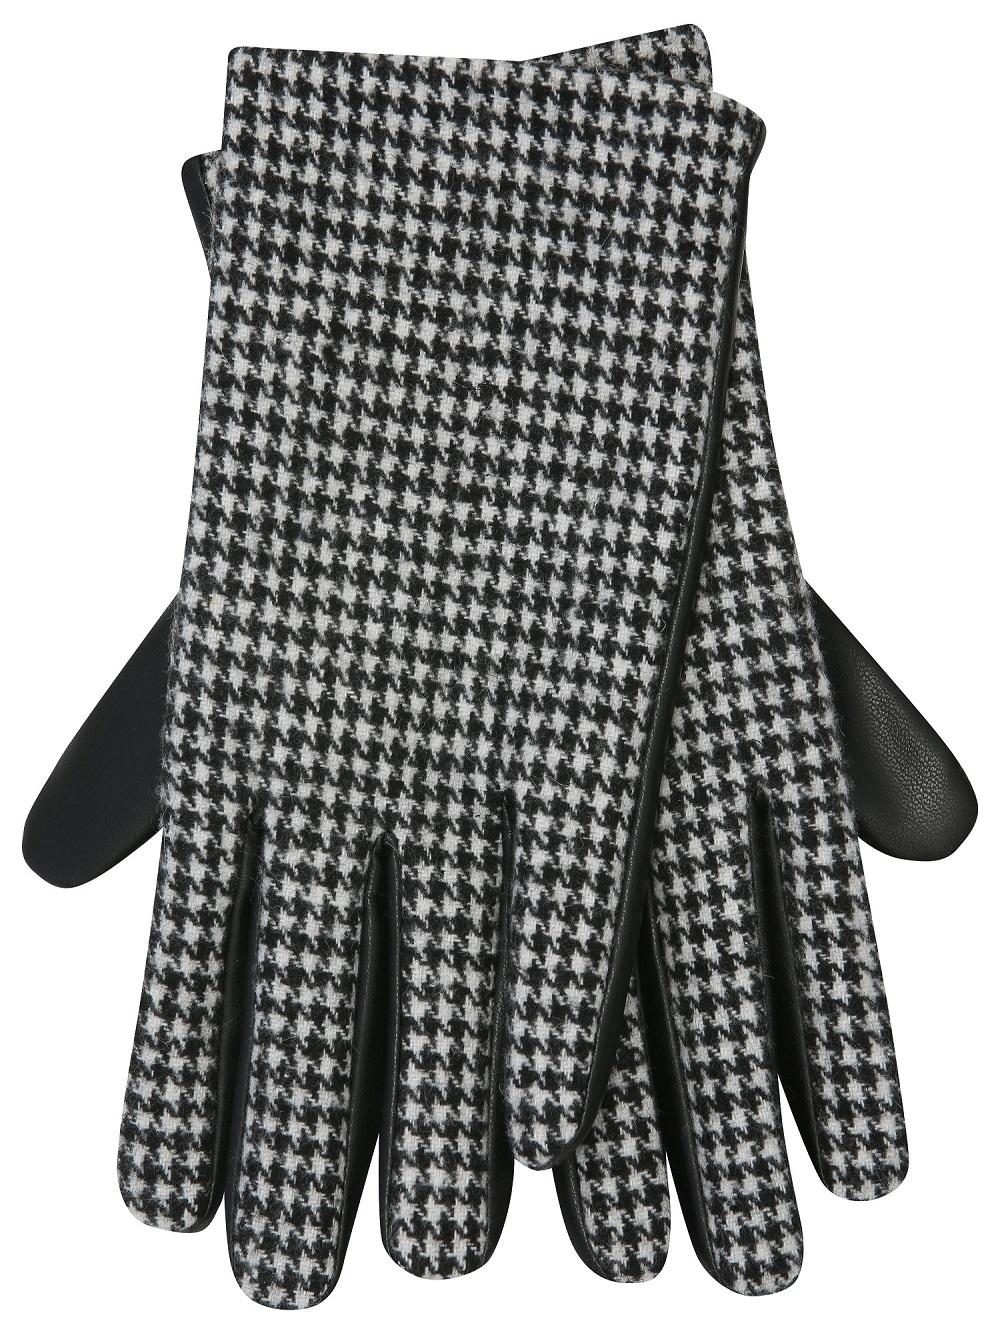 Dogtooth Gloves £16.99 Marks & Spencer